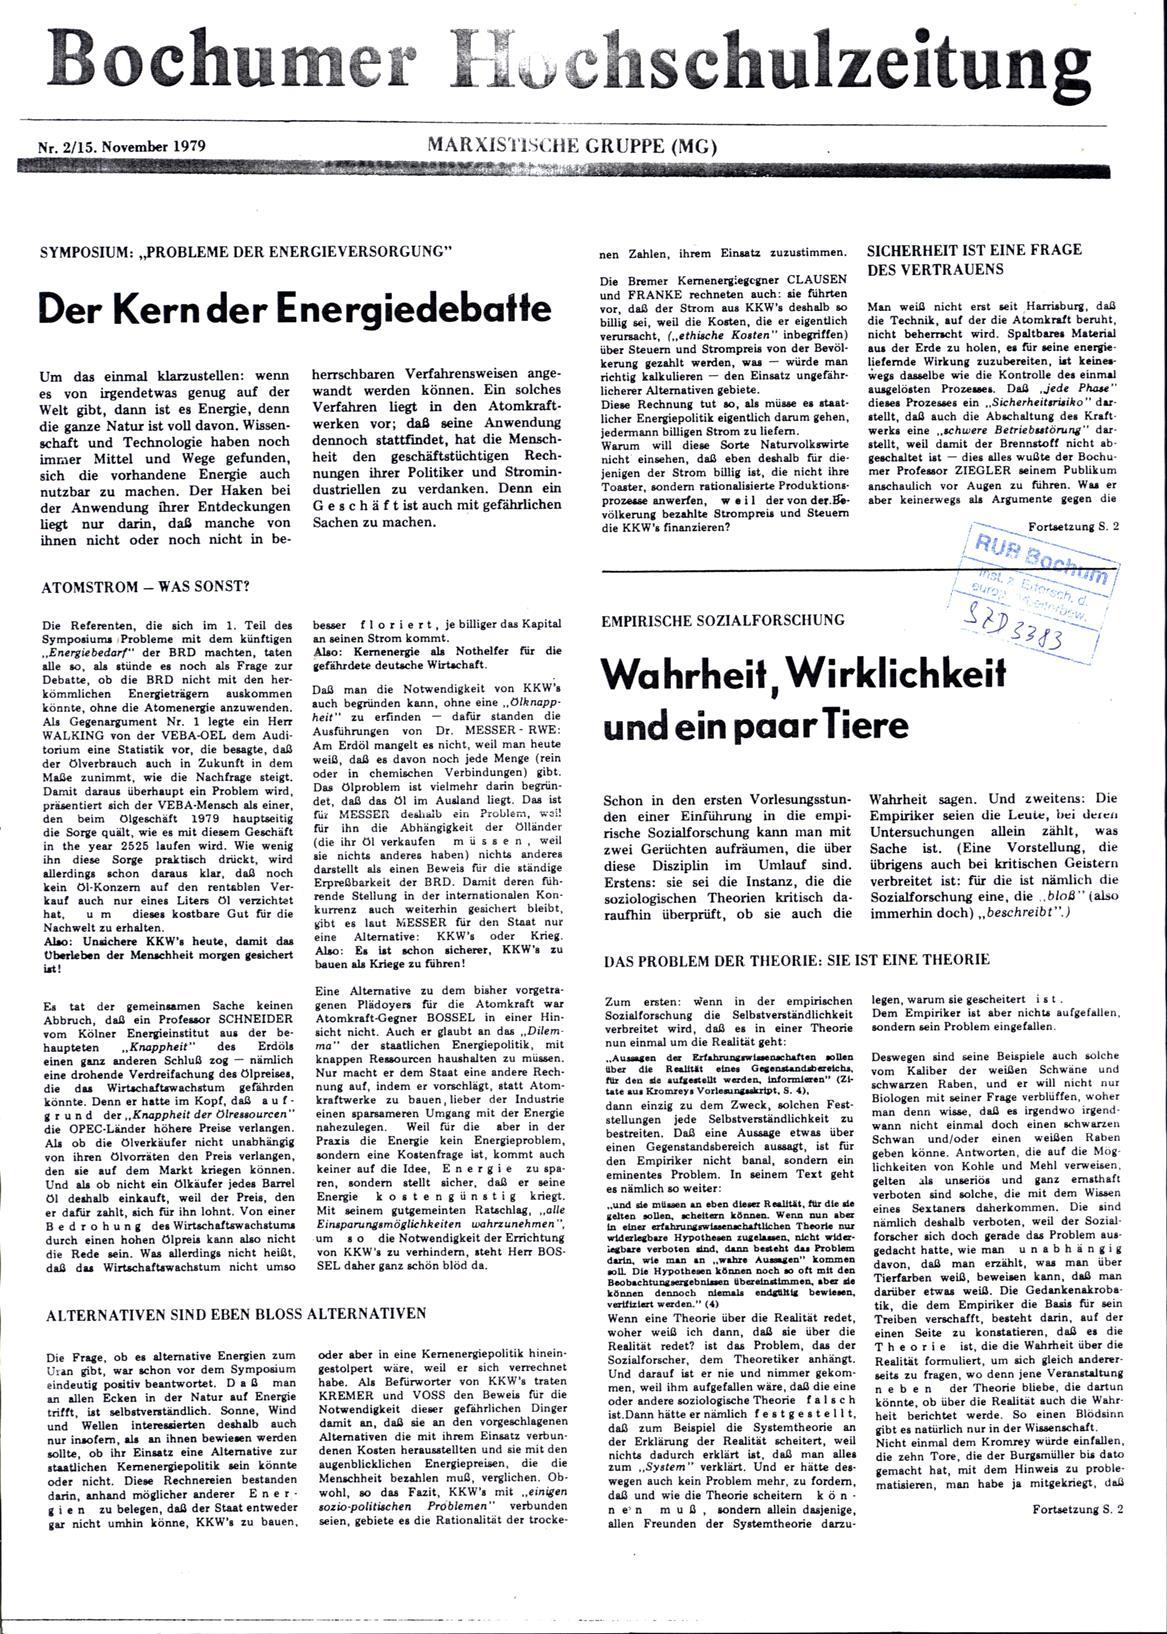 Bochum_BHZ_19791115_002_001